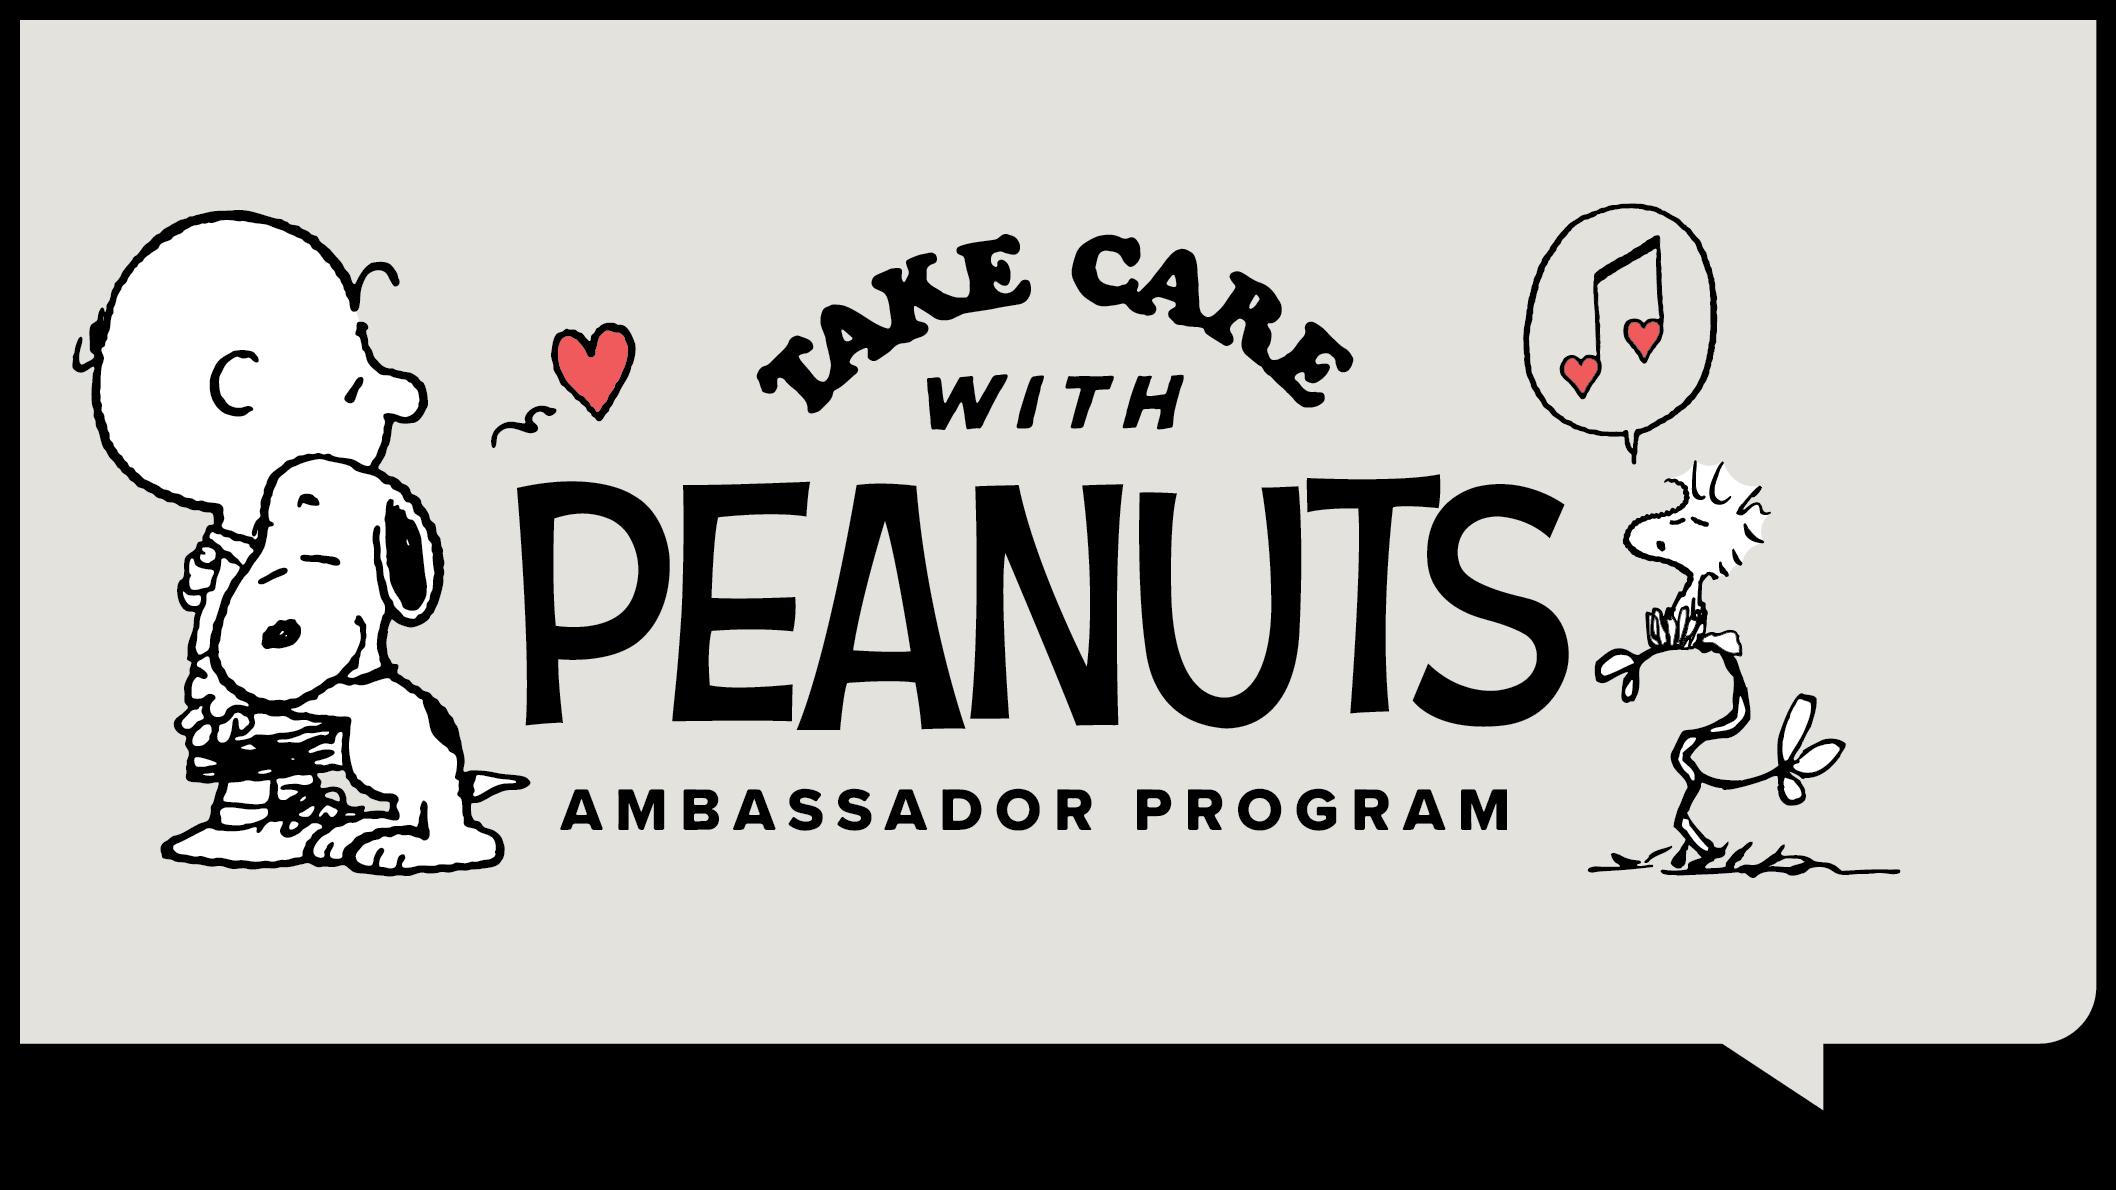 Take Care with Peanuts Ambassador Program